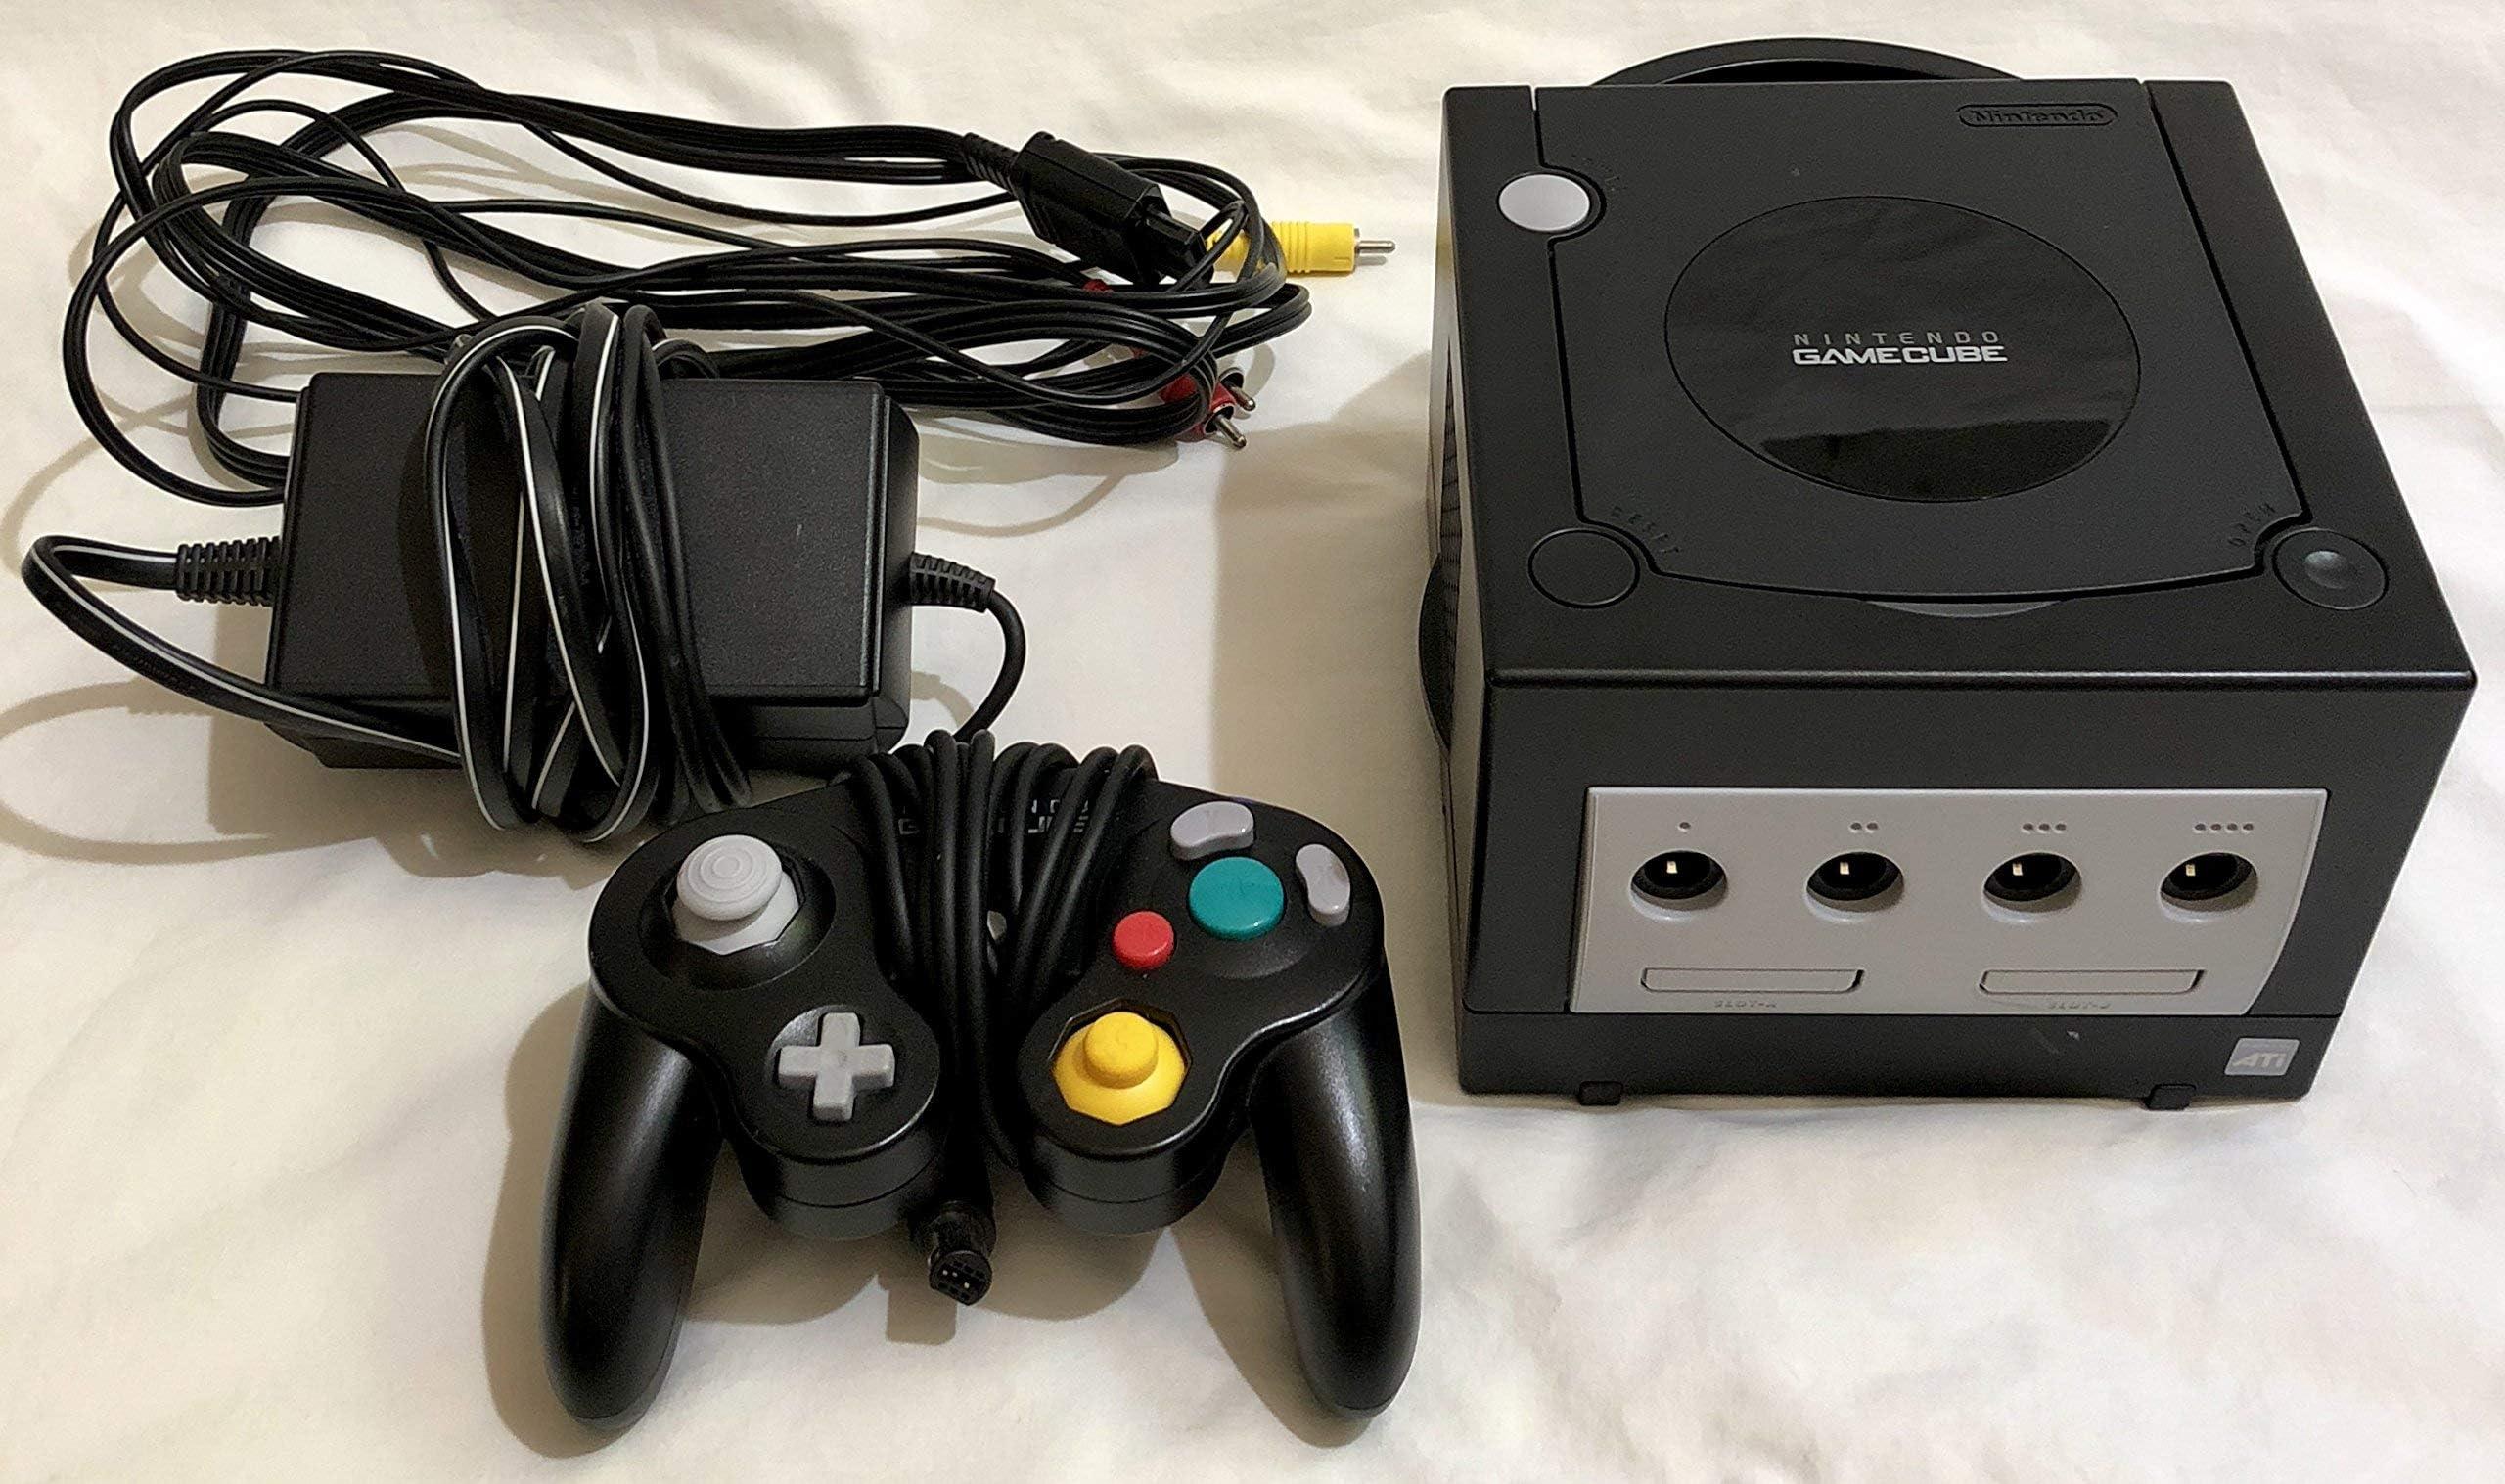 Amazon.com: Nintendo Gamecube System Console - Jet Black ...